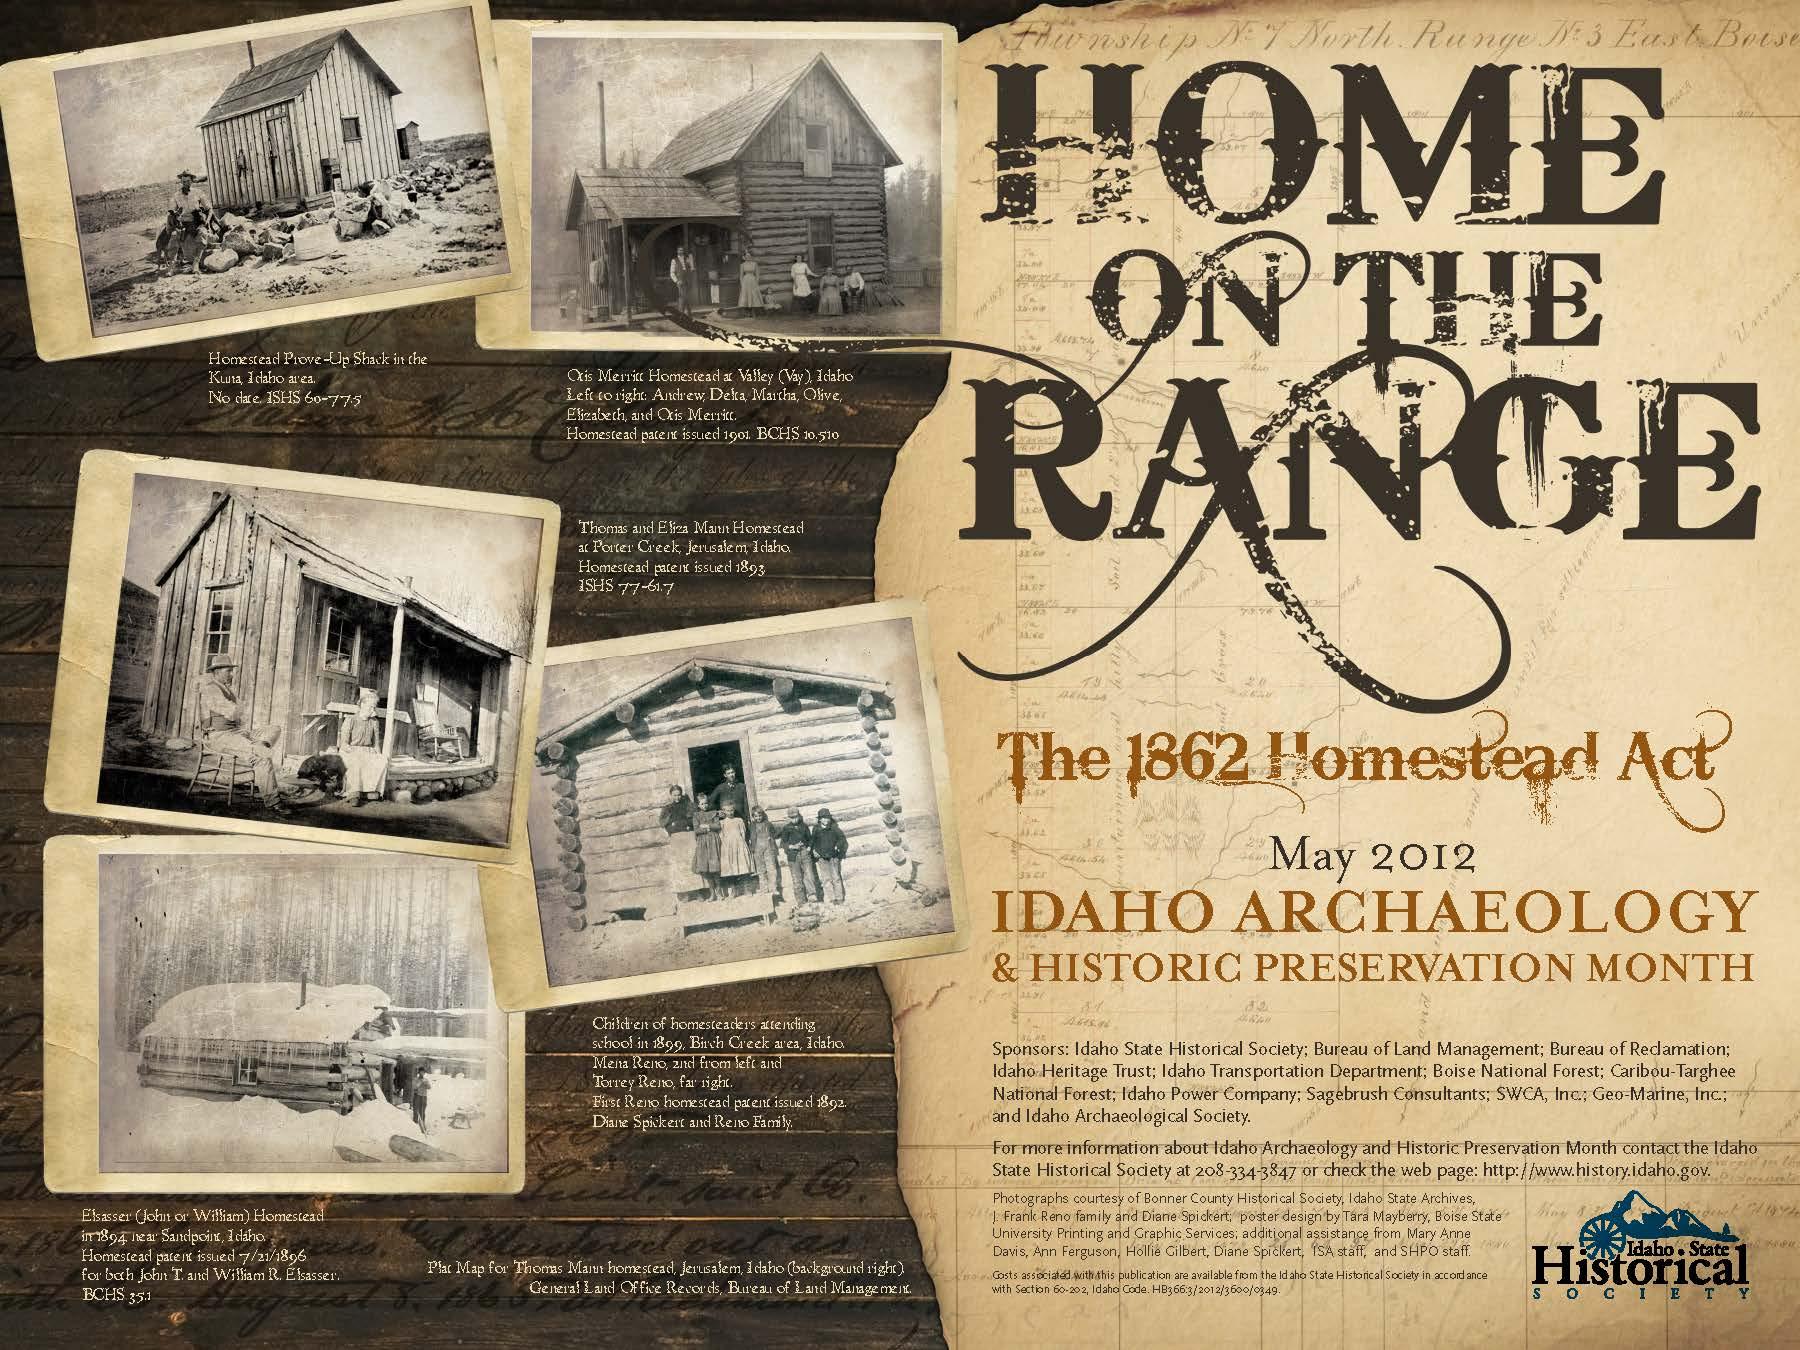 Idaho Archaeology and Historic Preservation Month - Idaho